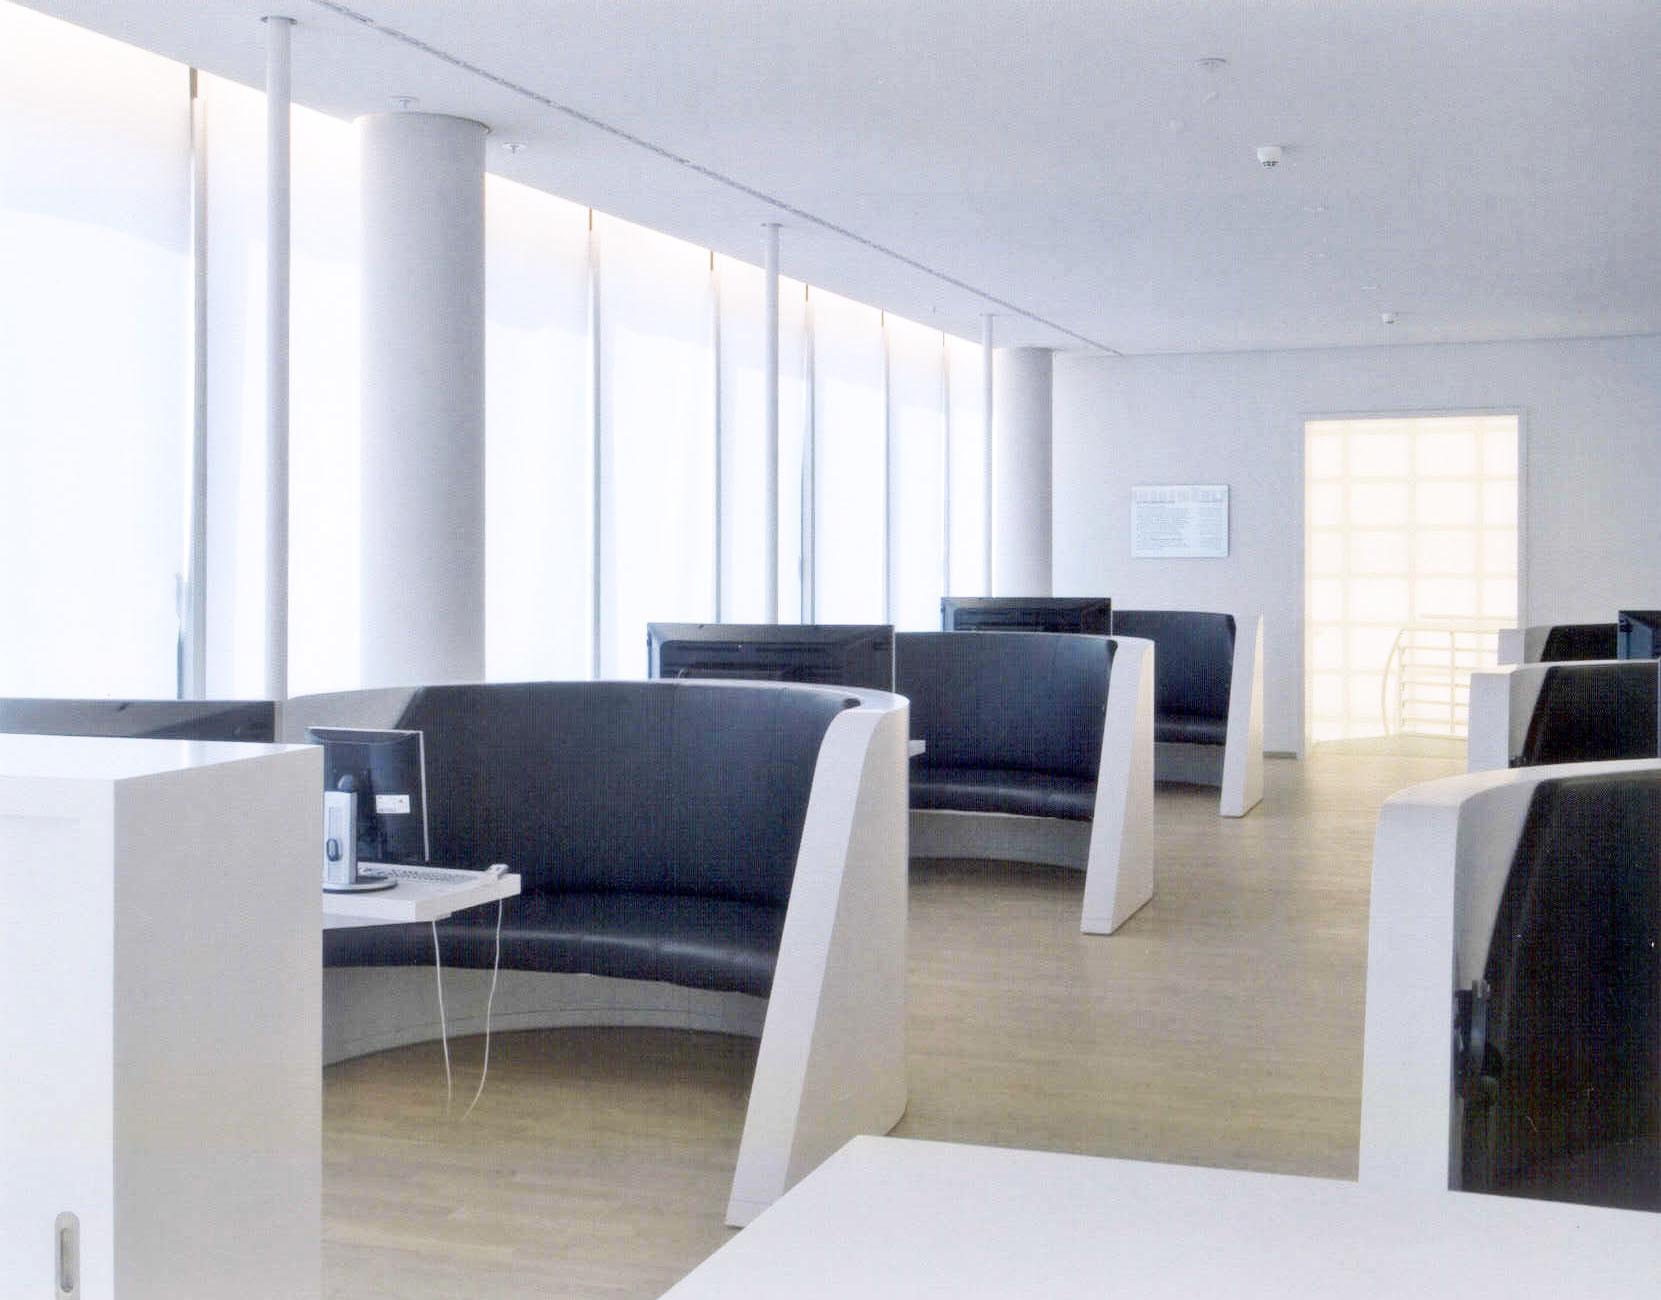 Detail Innenraum - bequeme Sessel in der Mediathek